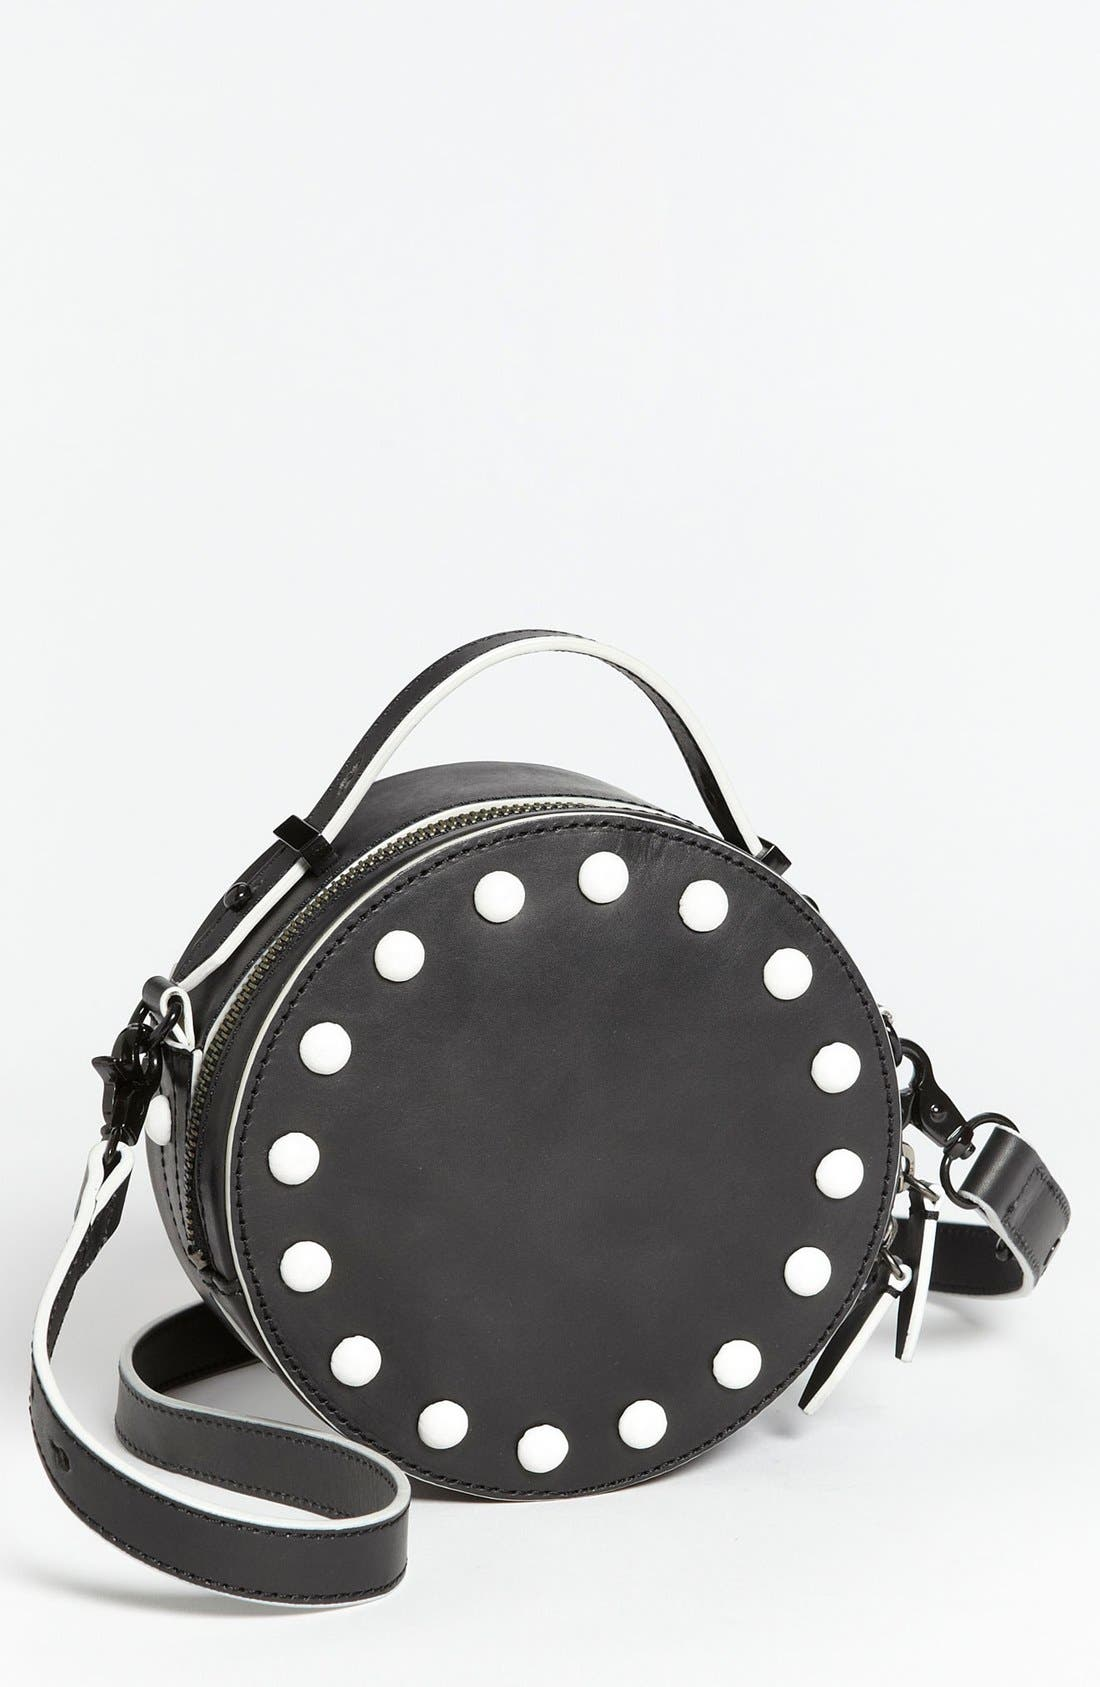 Main Image - Loeffler Randall 'Circle' Leather Crossbody Bag, Small